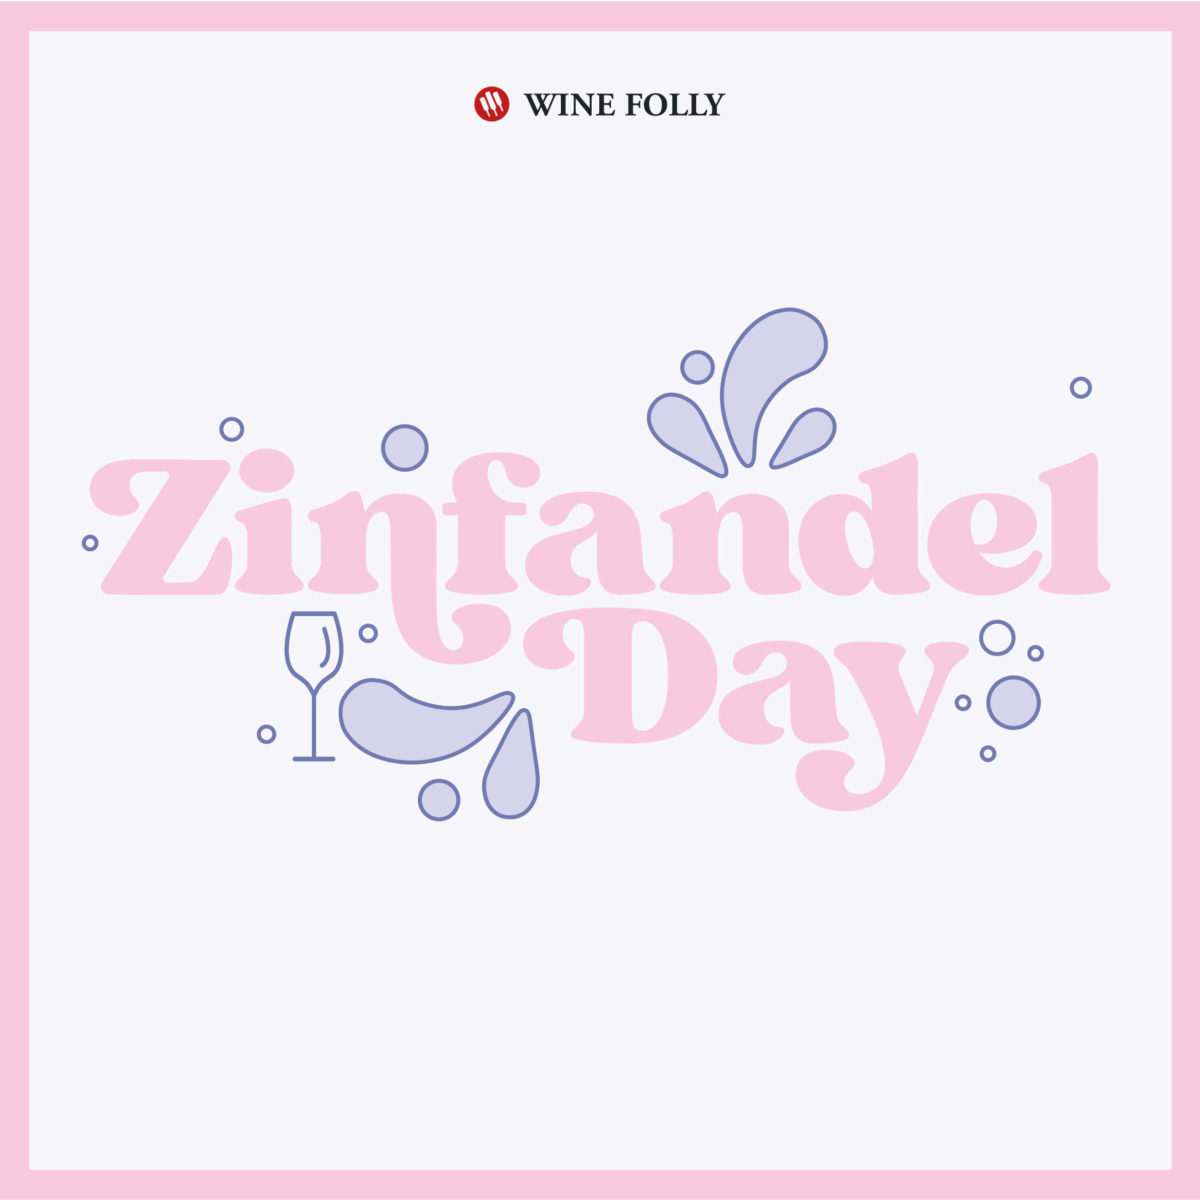 wine-holidays-zinfandel